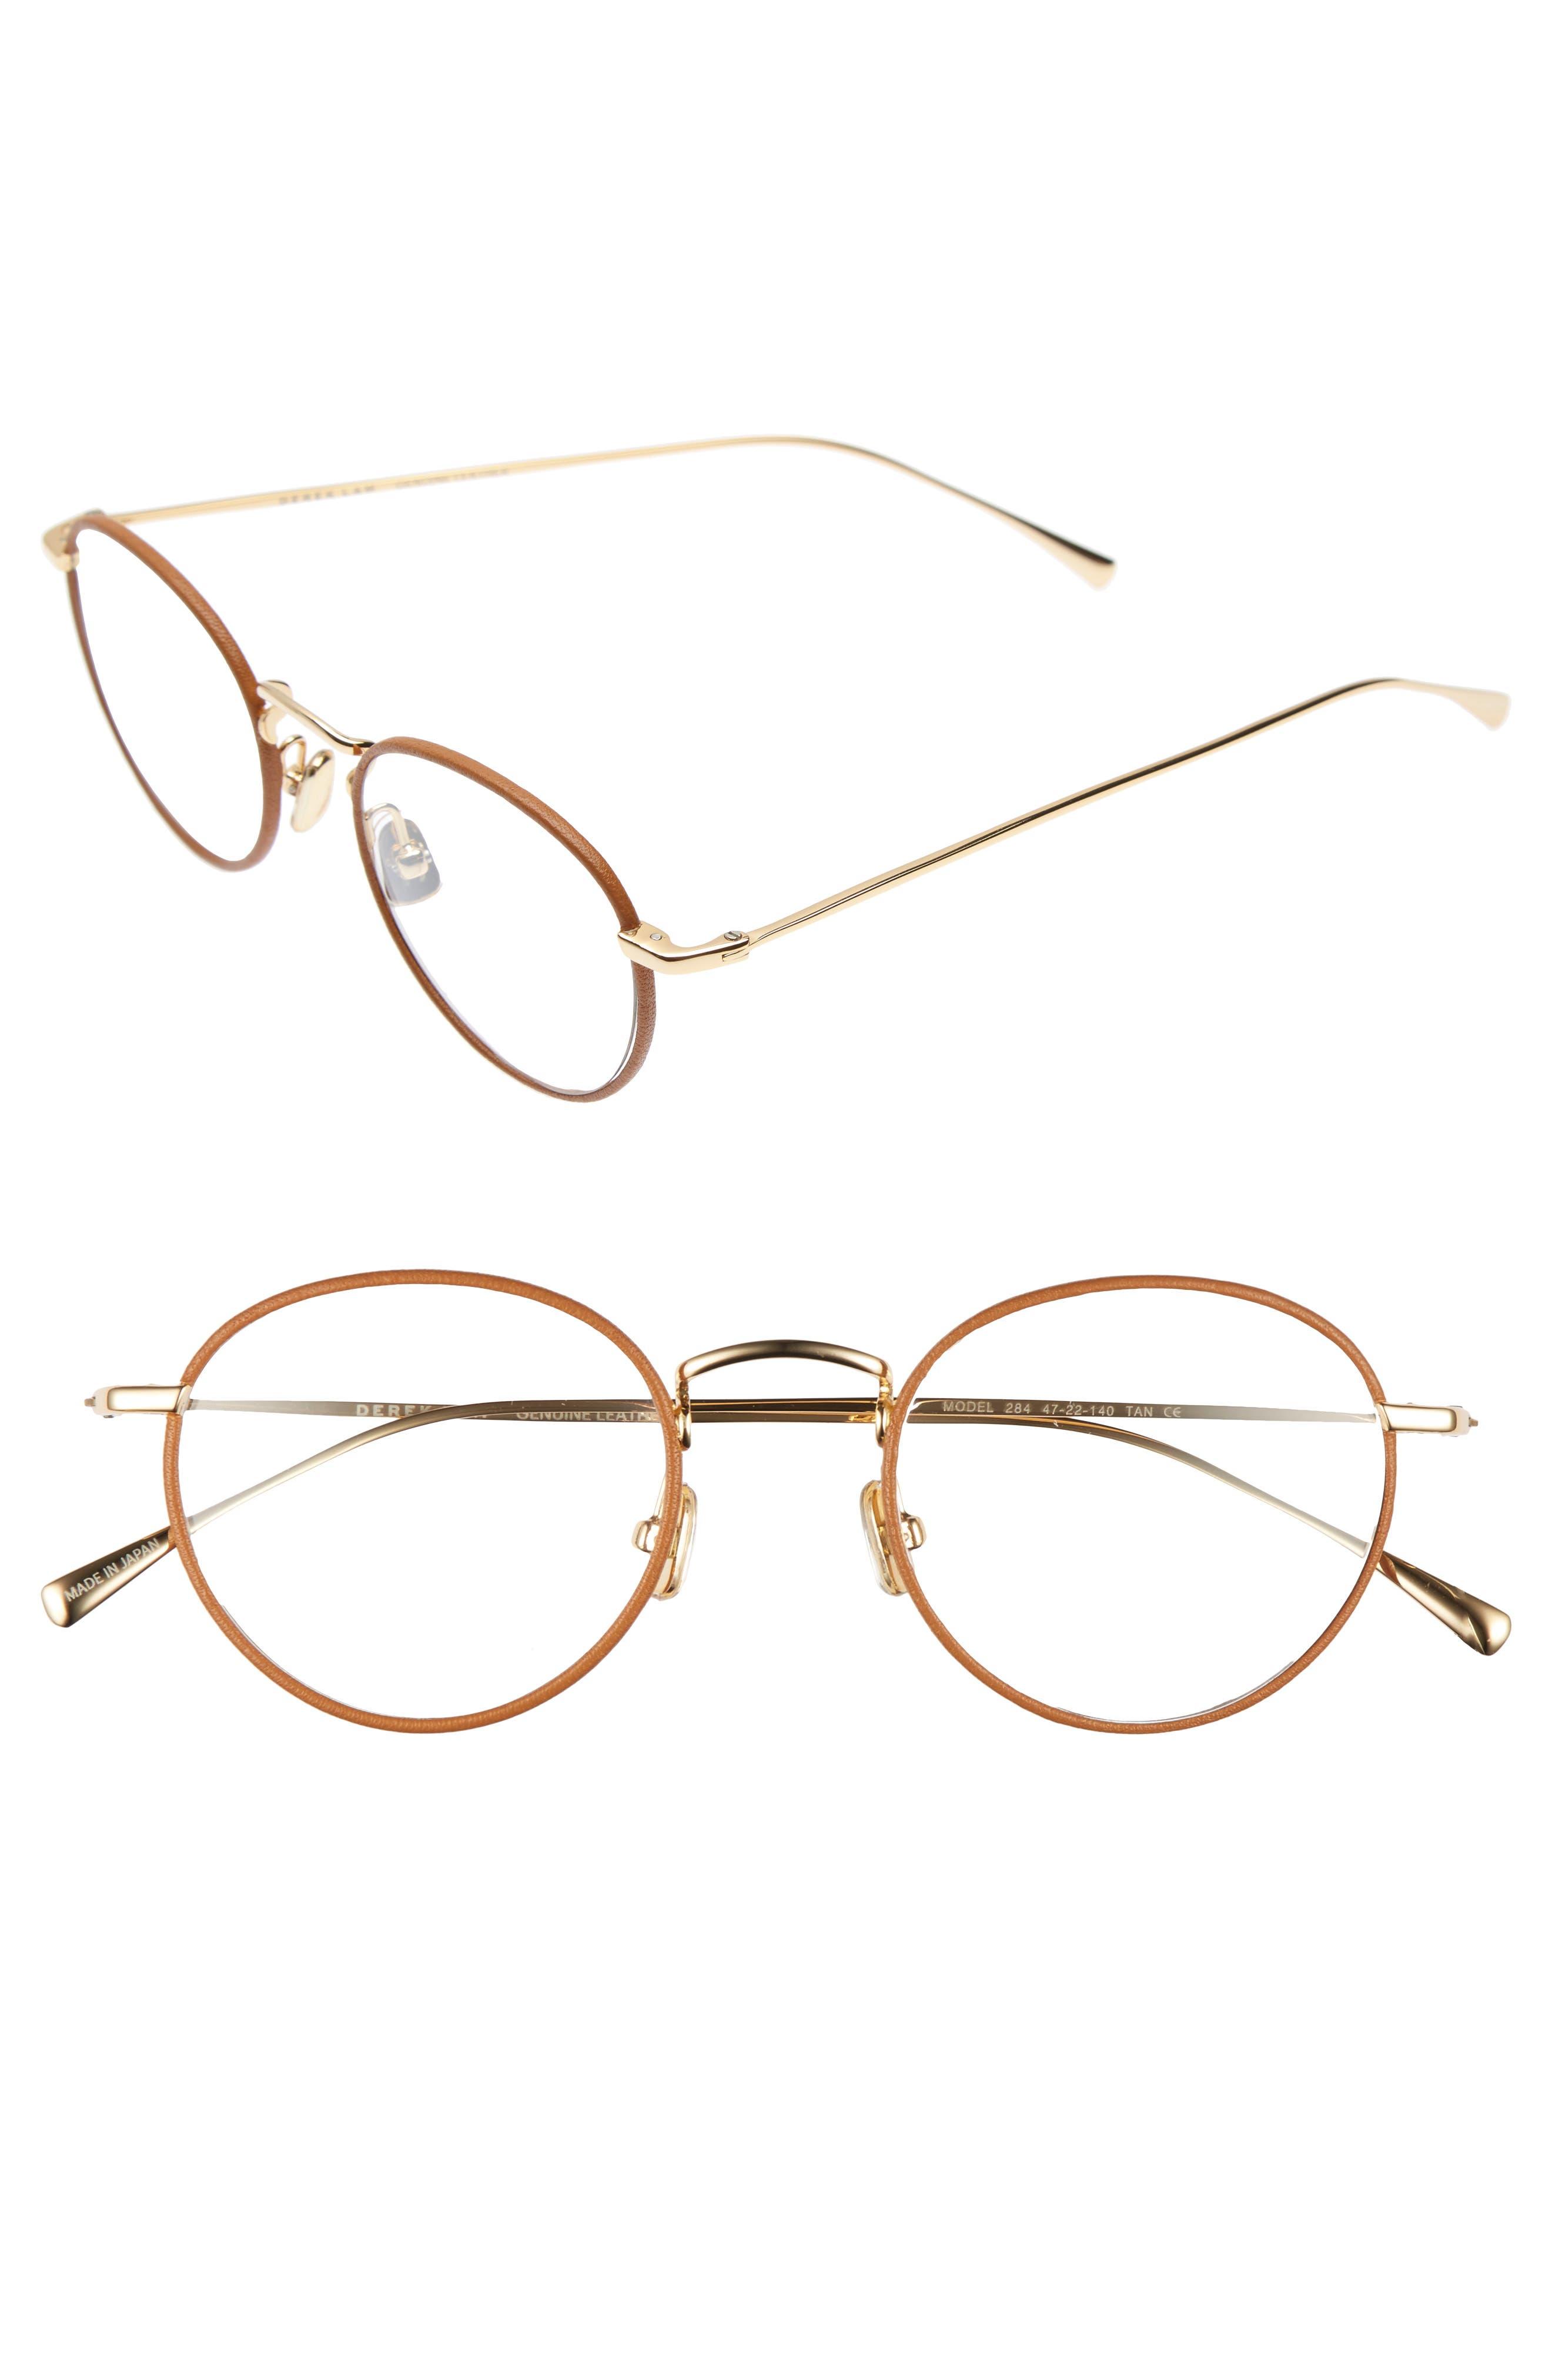 47mm Optical Glasses,                             Main thumbnail 1, color,                             Tan